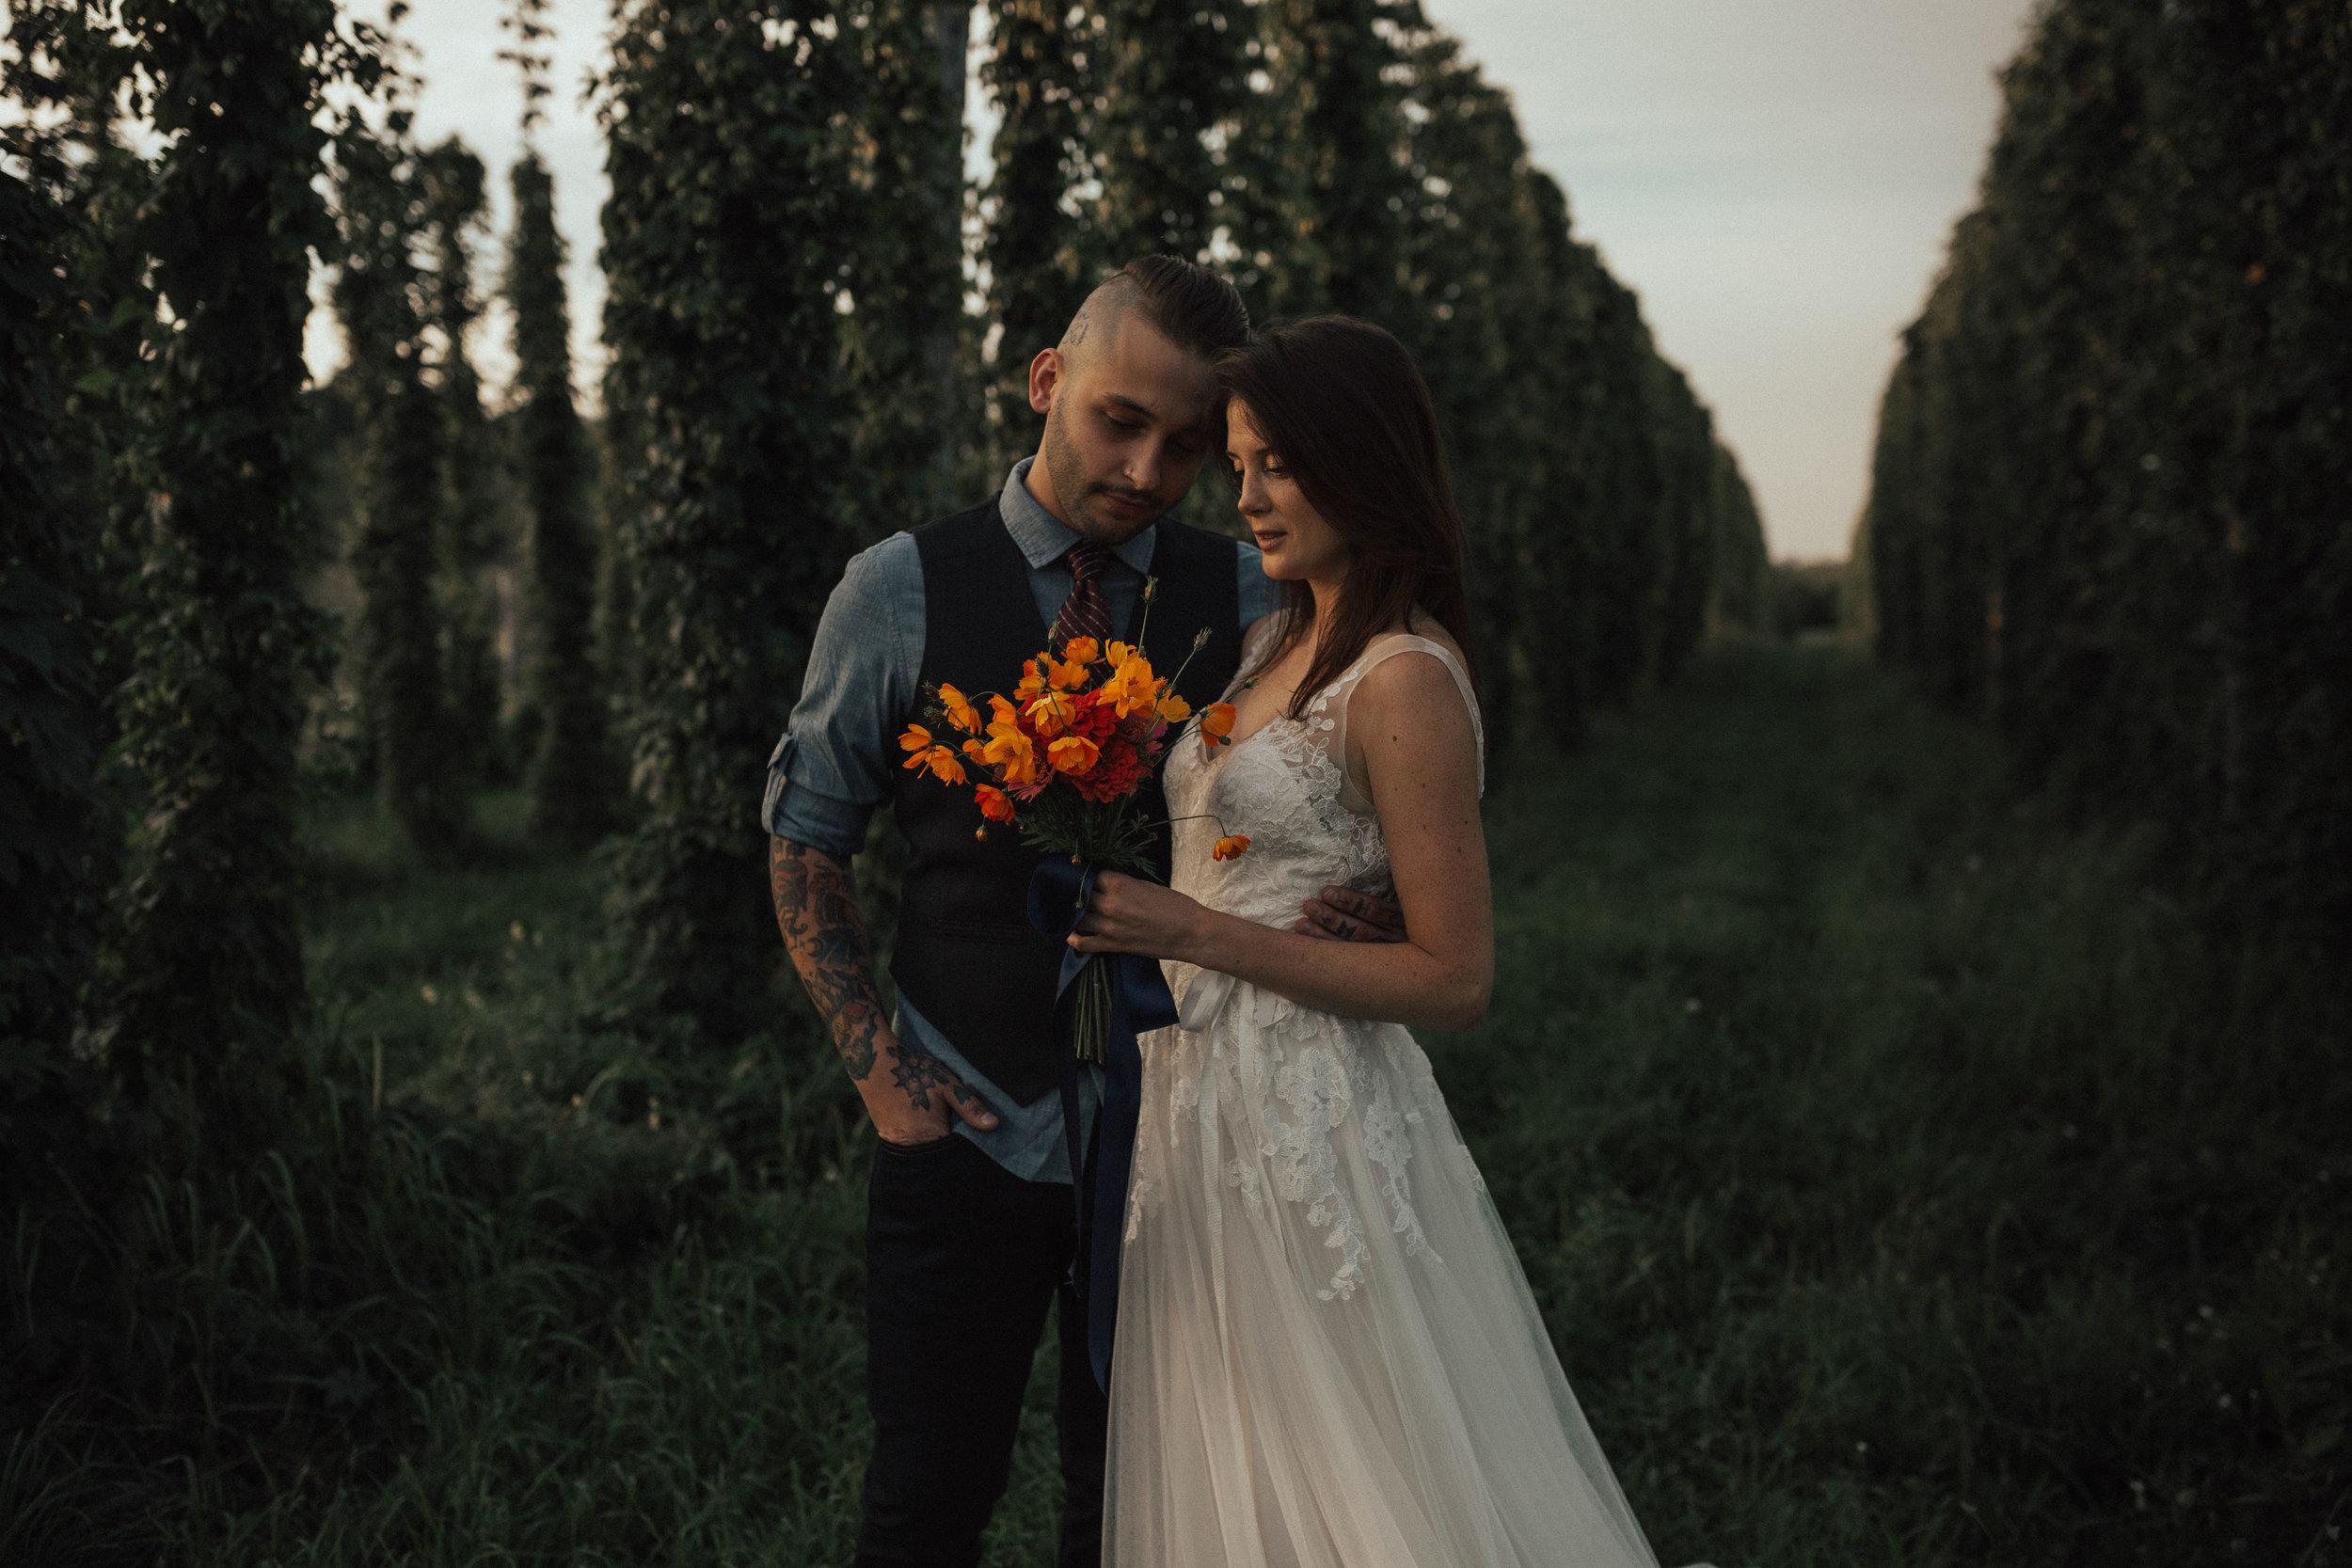 upstate_new_york_wedding_photos_0006.JPG